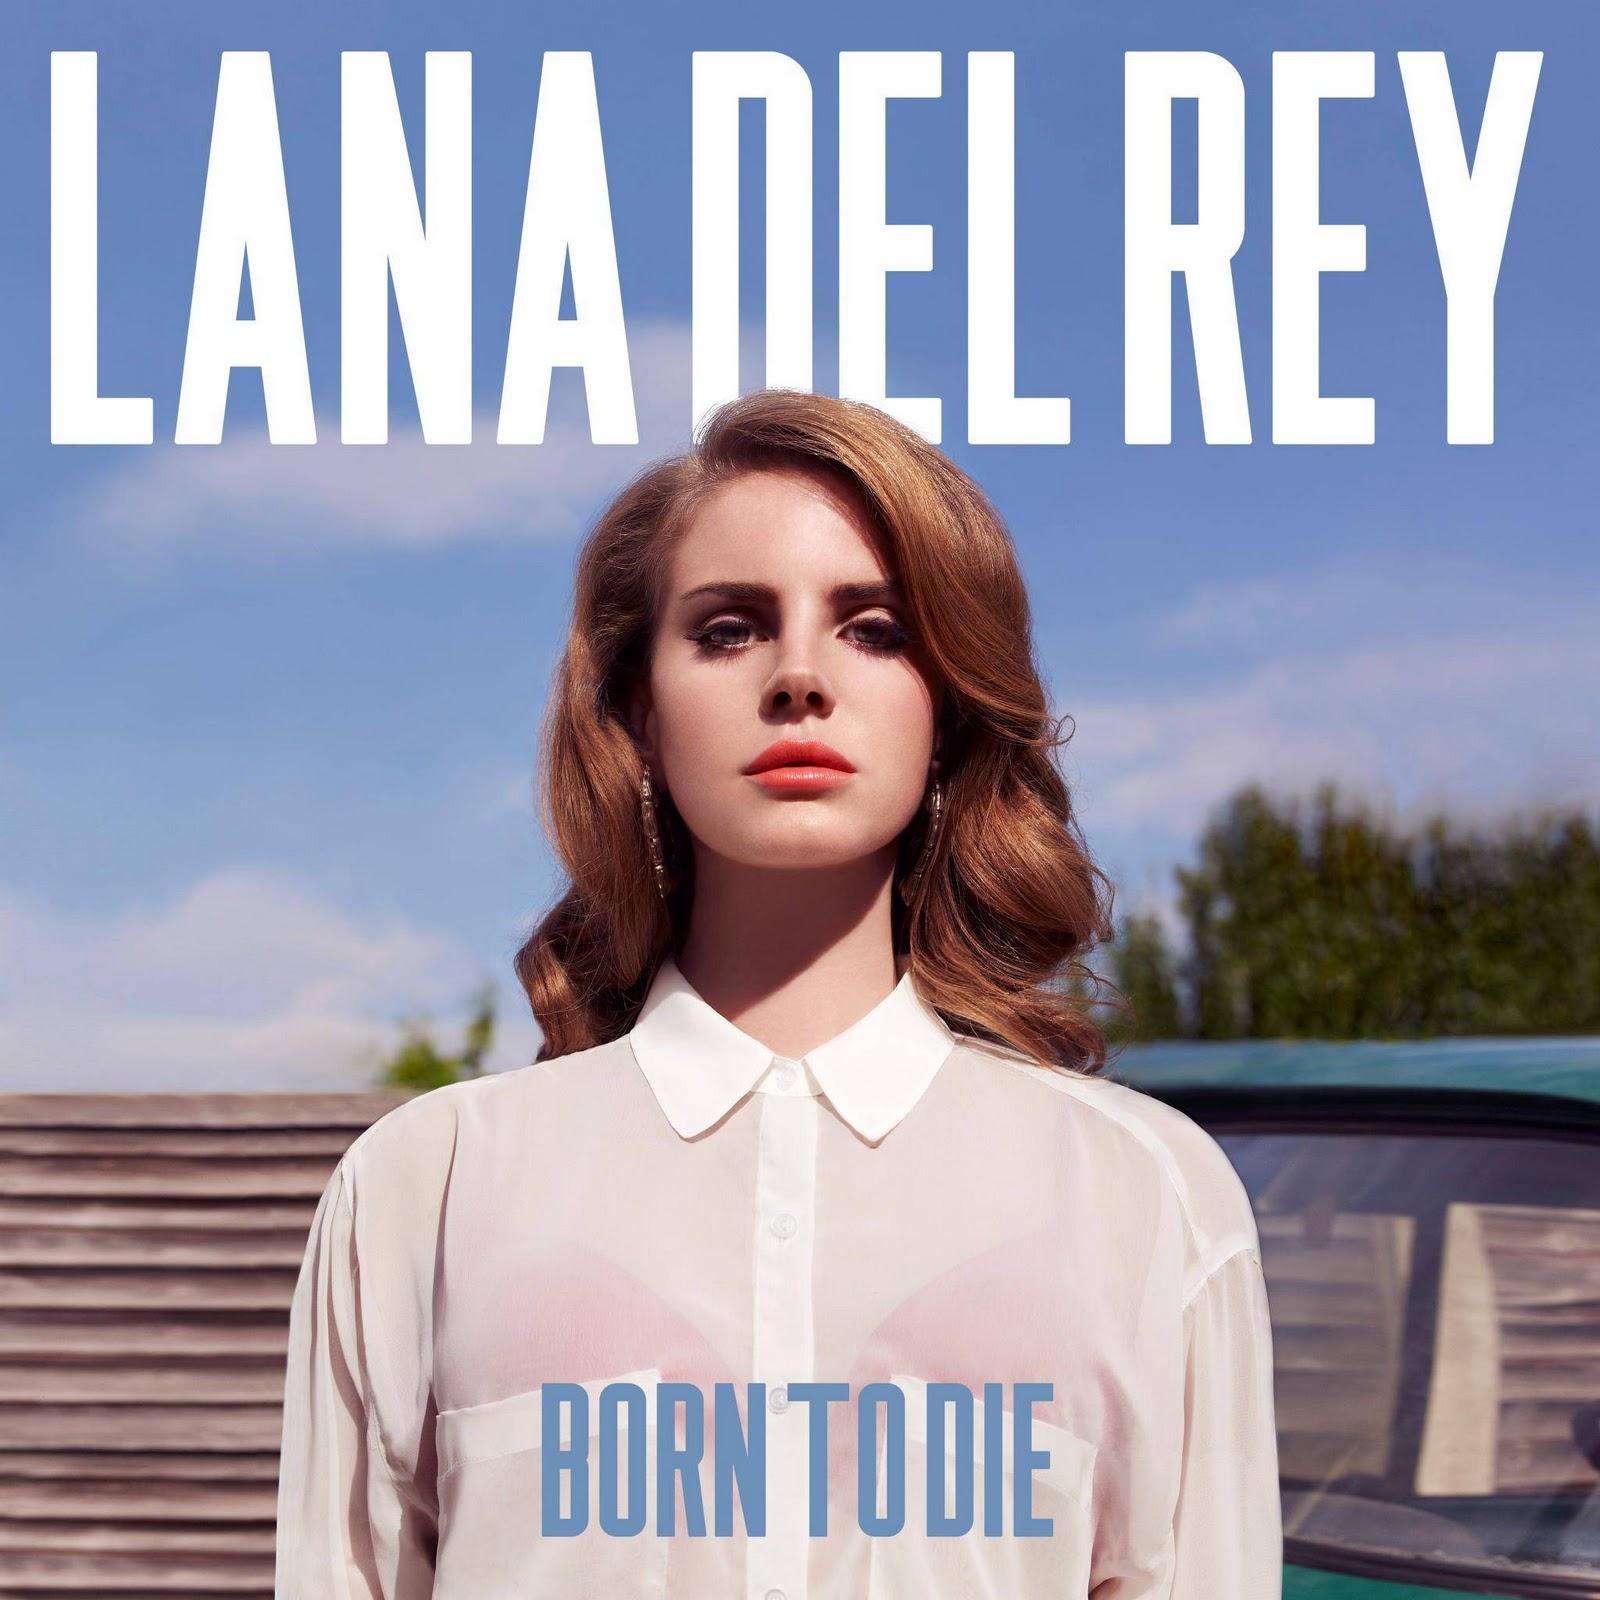 d6f6421e7e7a Damien Hirst y Lana del Rey: La muerte es cool | PERIFERIA ÜBER ALLES